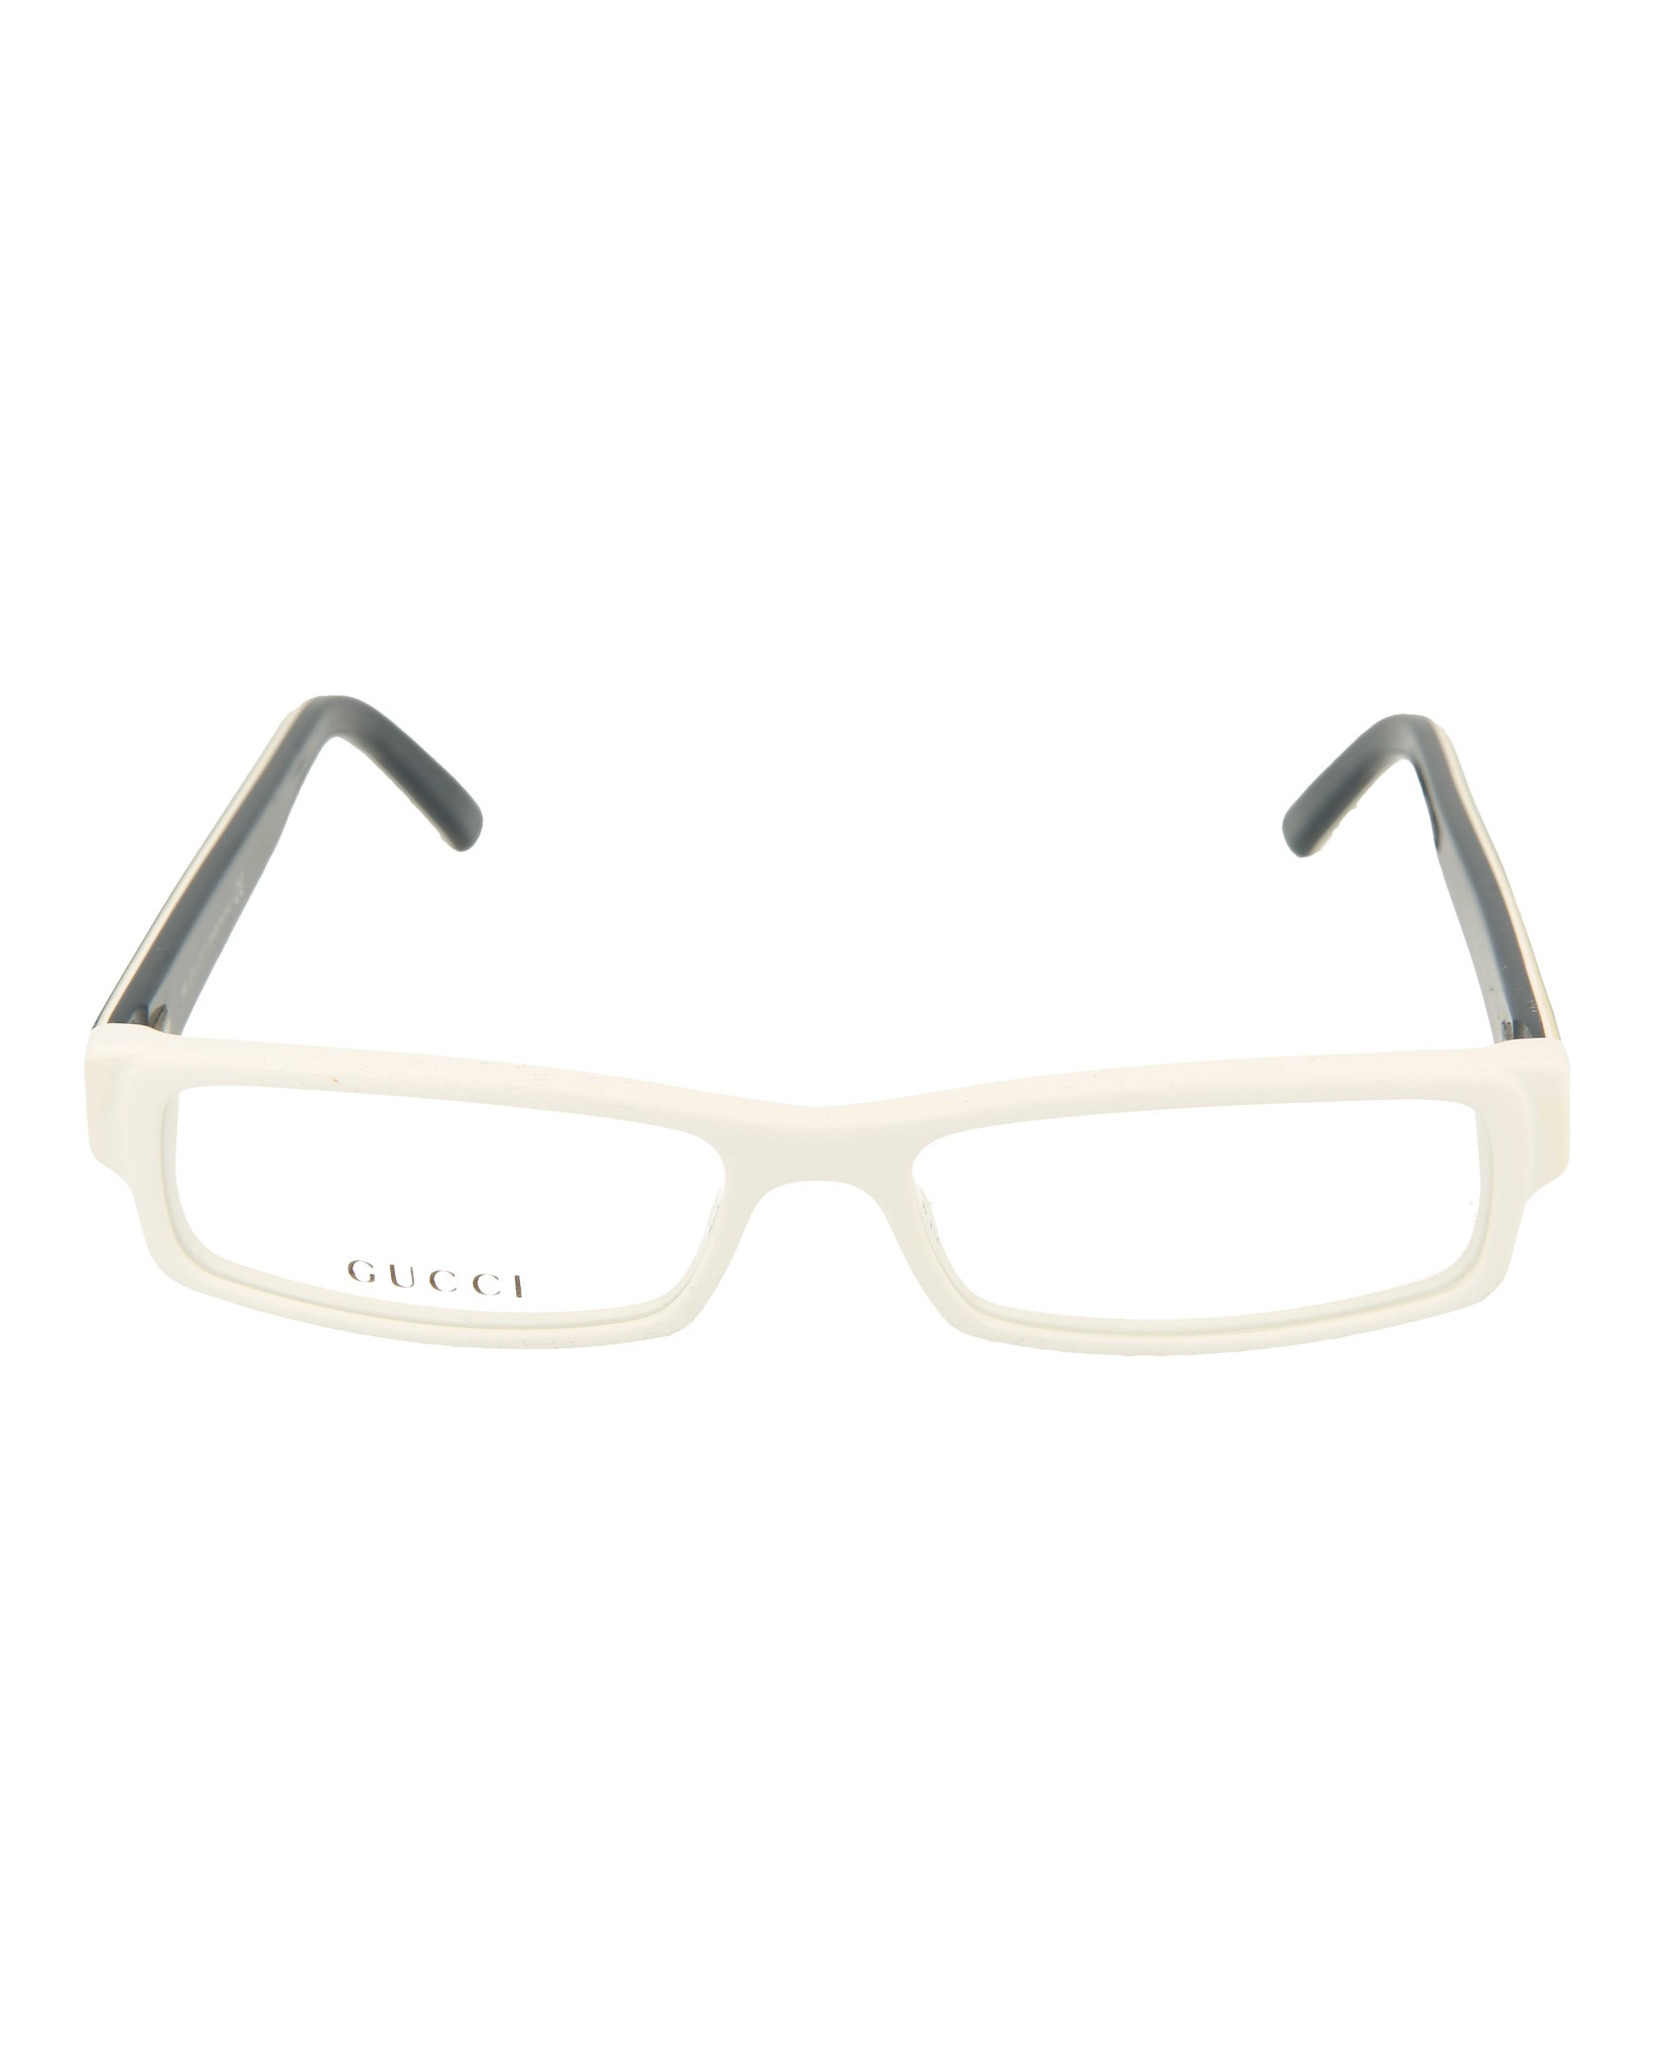 7ece0e105a3d0 Gucci Mens Square Rectangle Optical Frames GG1576-510205EOC-5315 ...